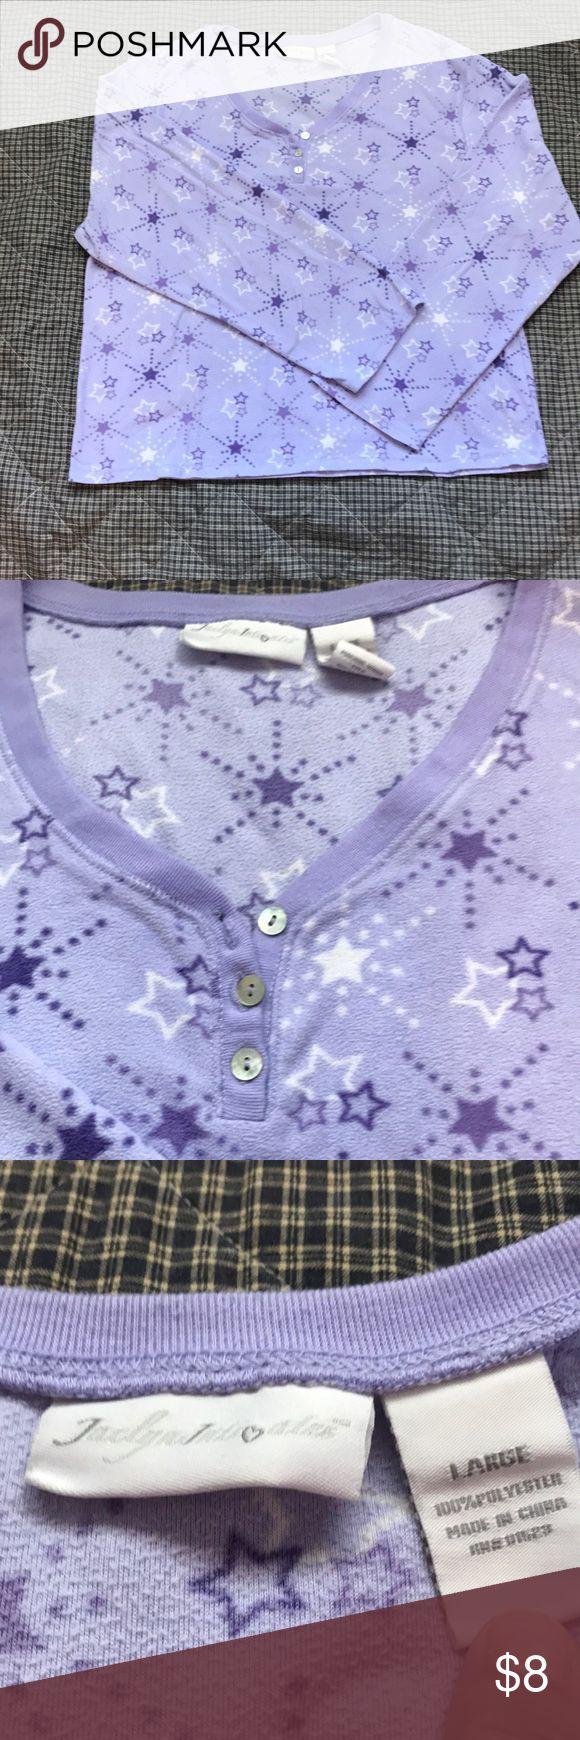 Fleece pajama top Super soft fleece pajama top, purple with stars. EUC Jaclyn Intimates Intimates & Sleepwear Pajamas